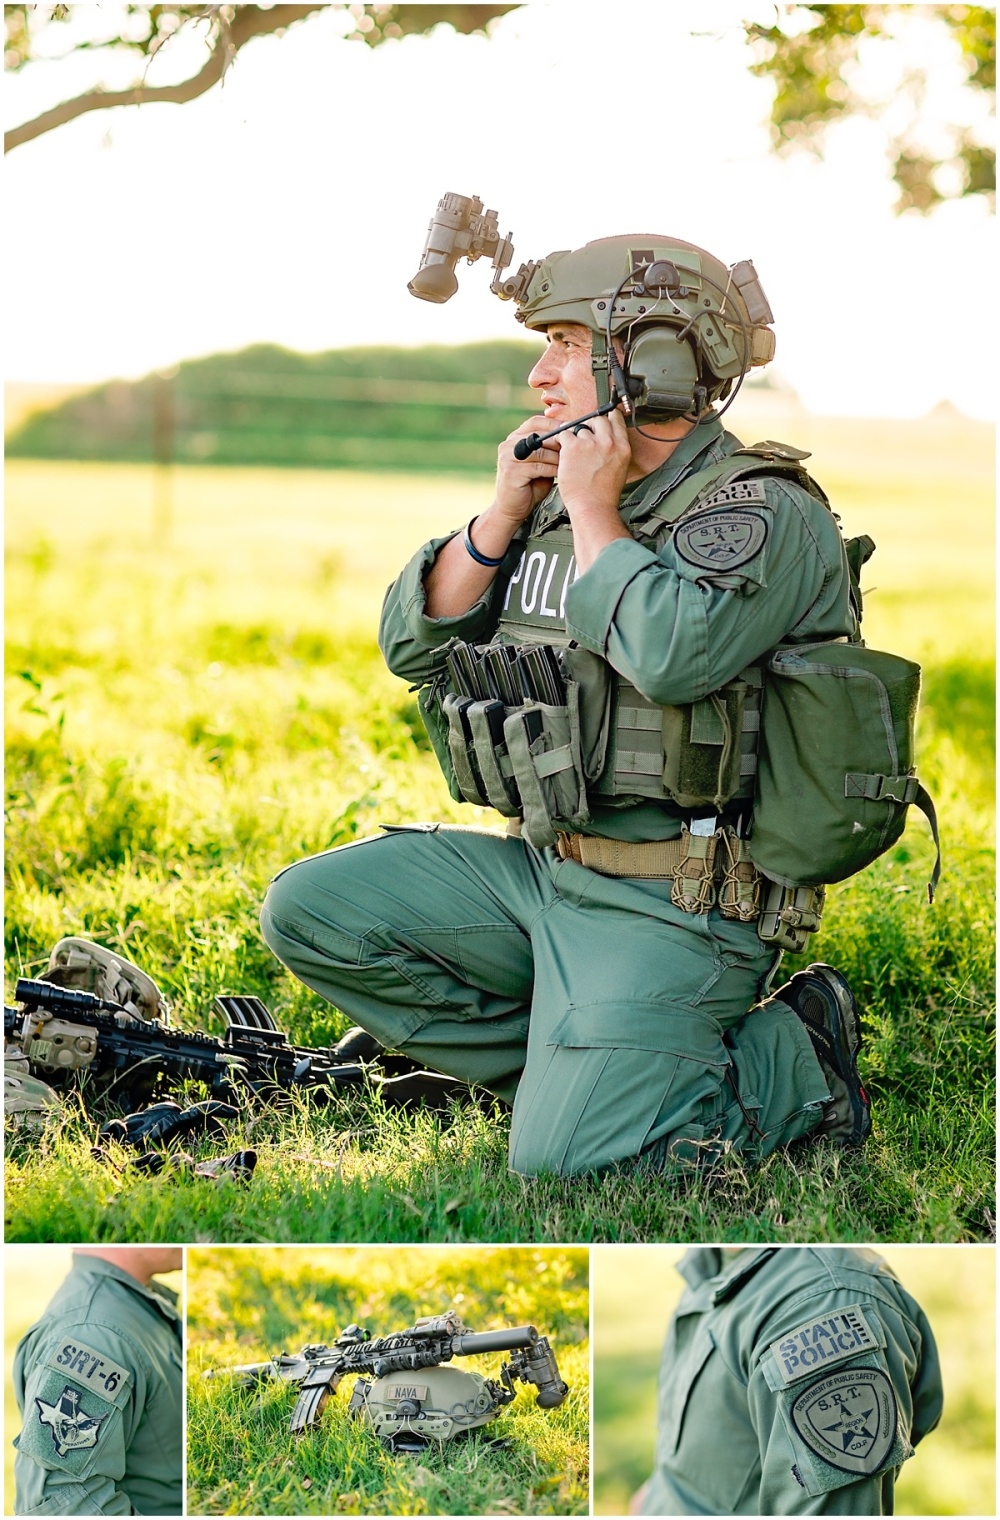 Portraits-State-Trooper-Photos-San-Antonio-Hill-Country-Texas-Carly-Barton-Photography_0002.jpg